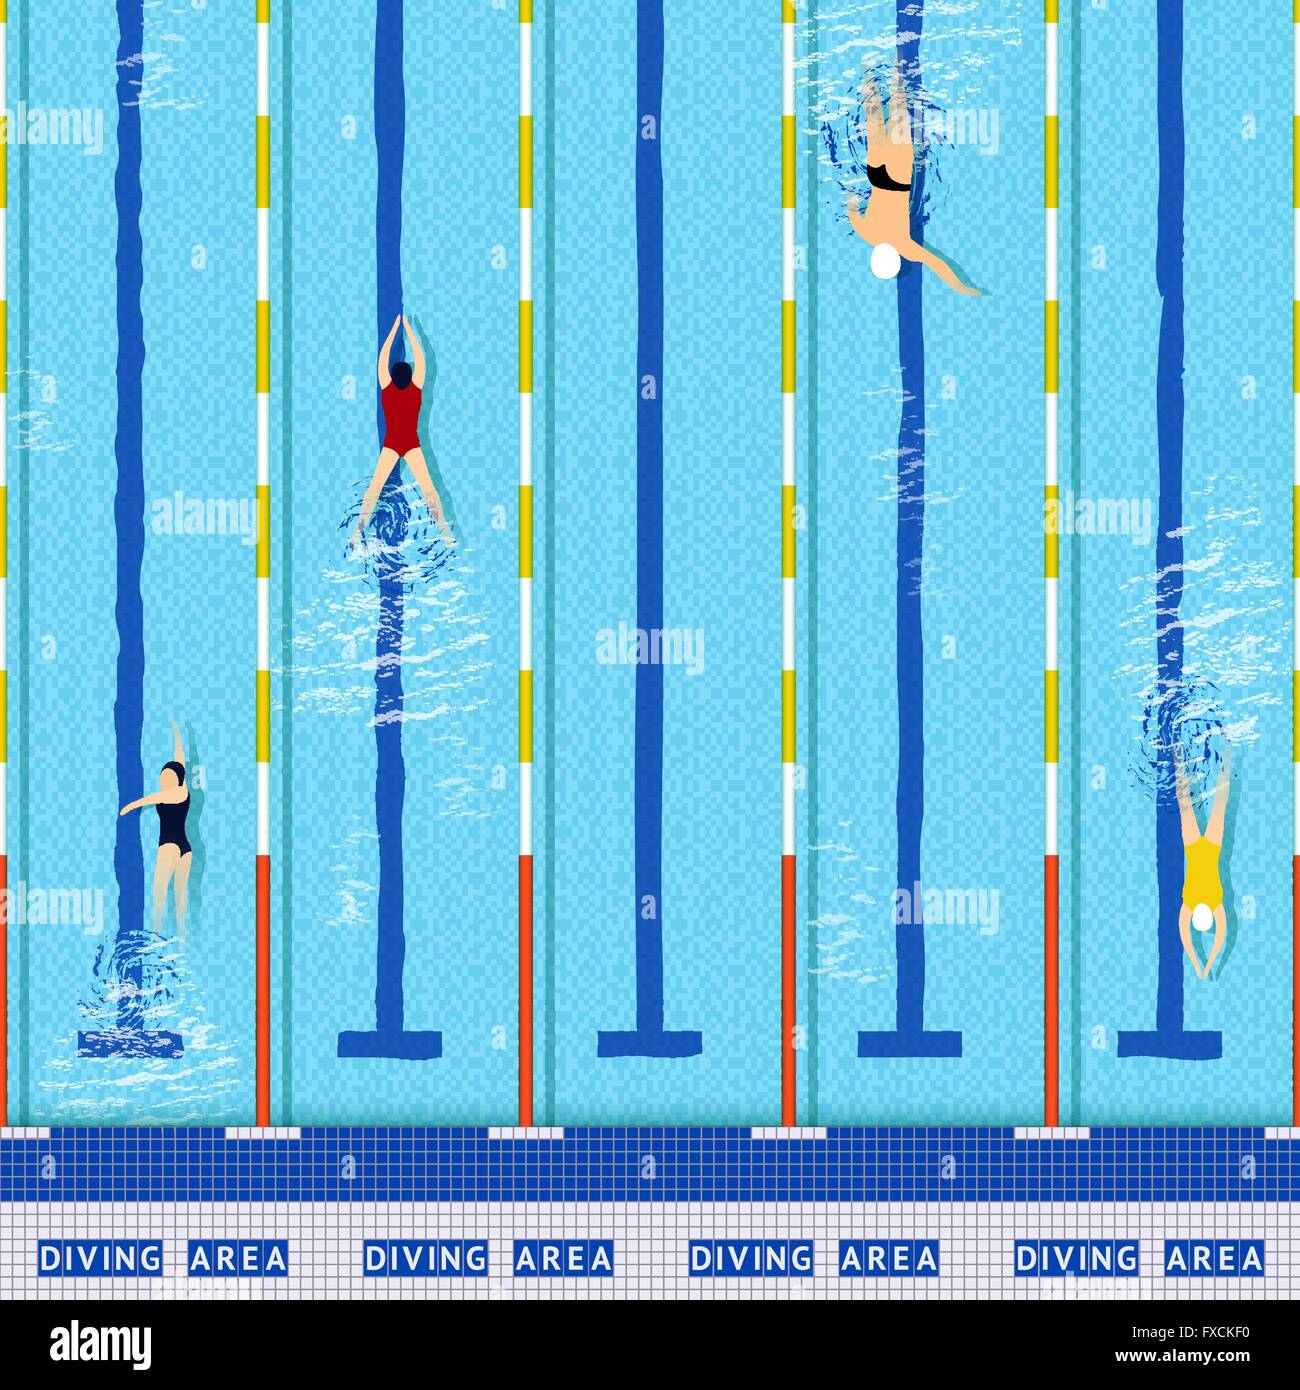 Swimming pool top view - Stock Vector